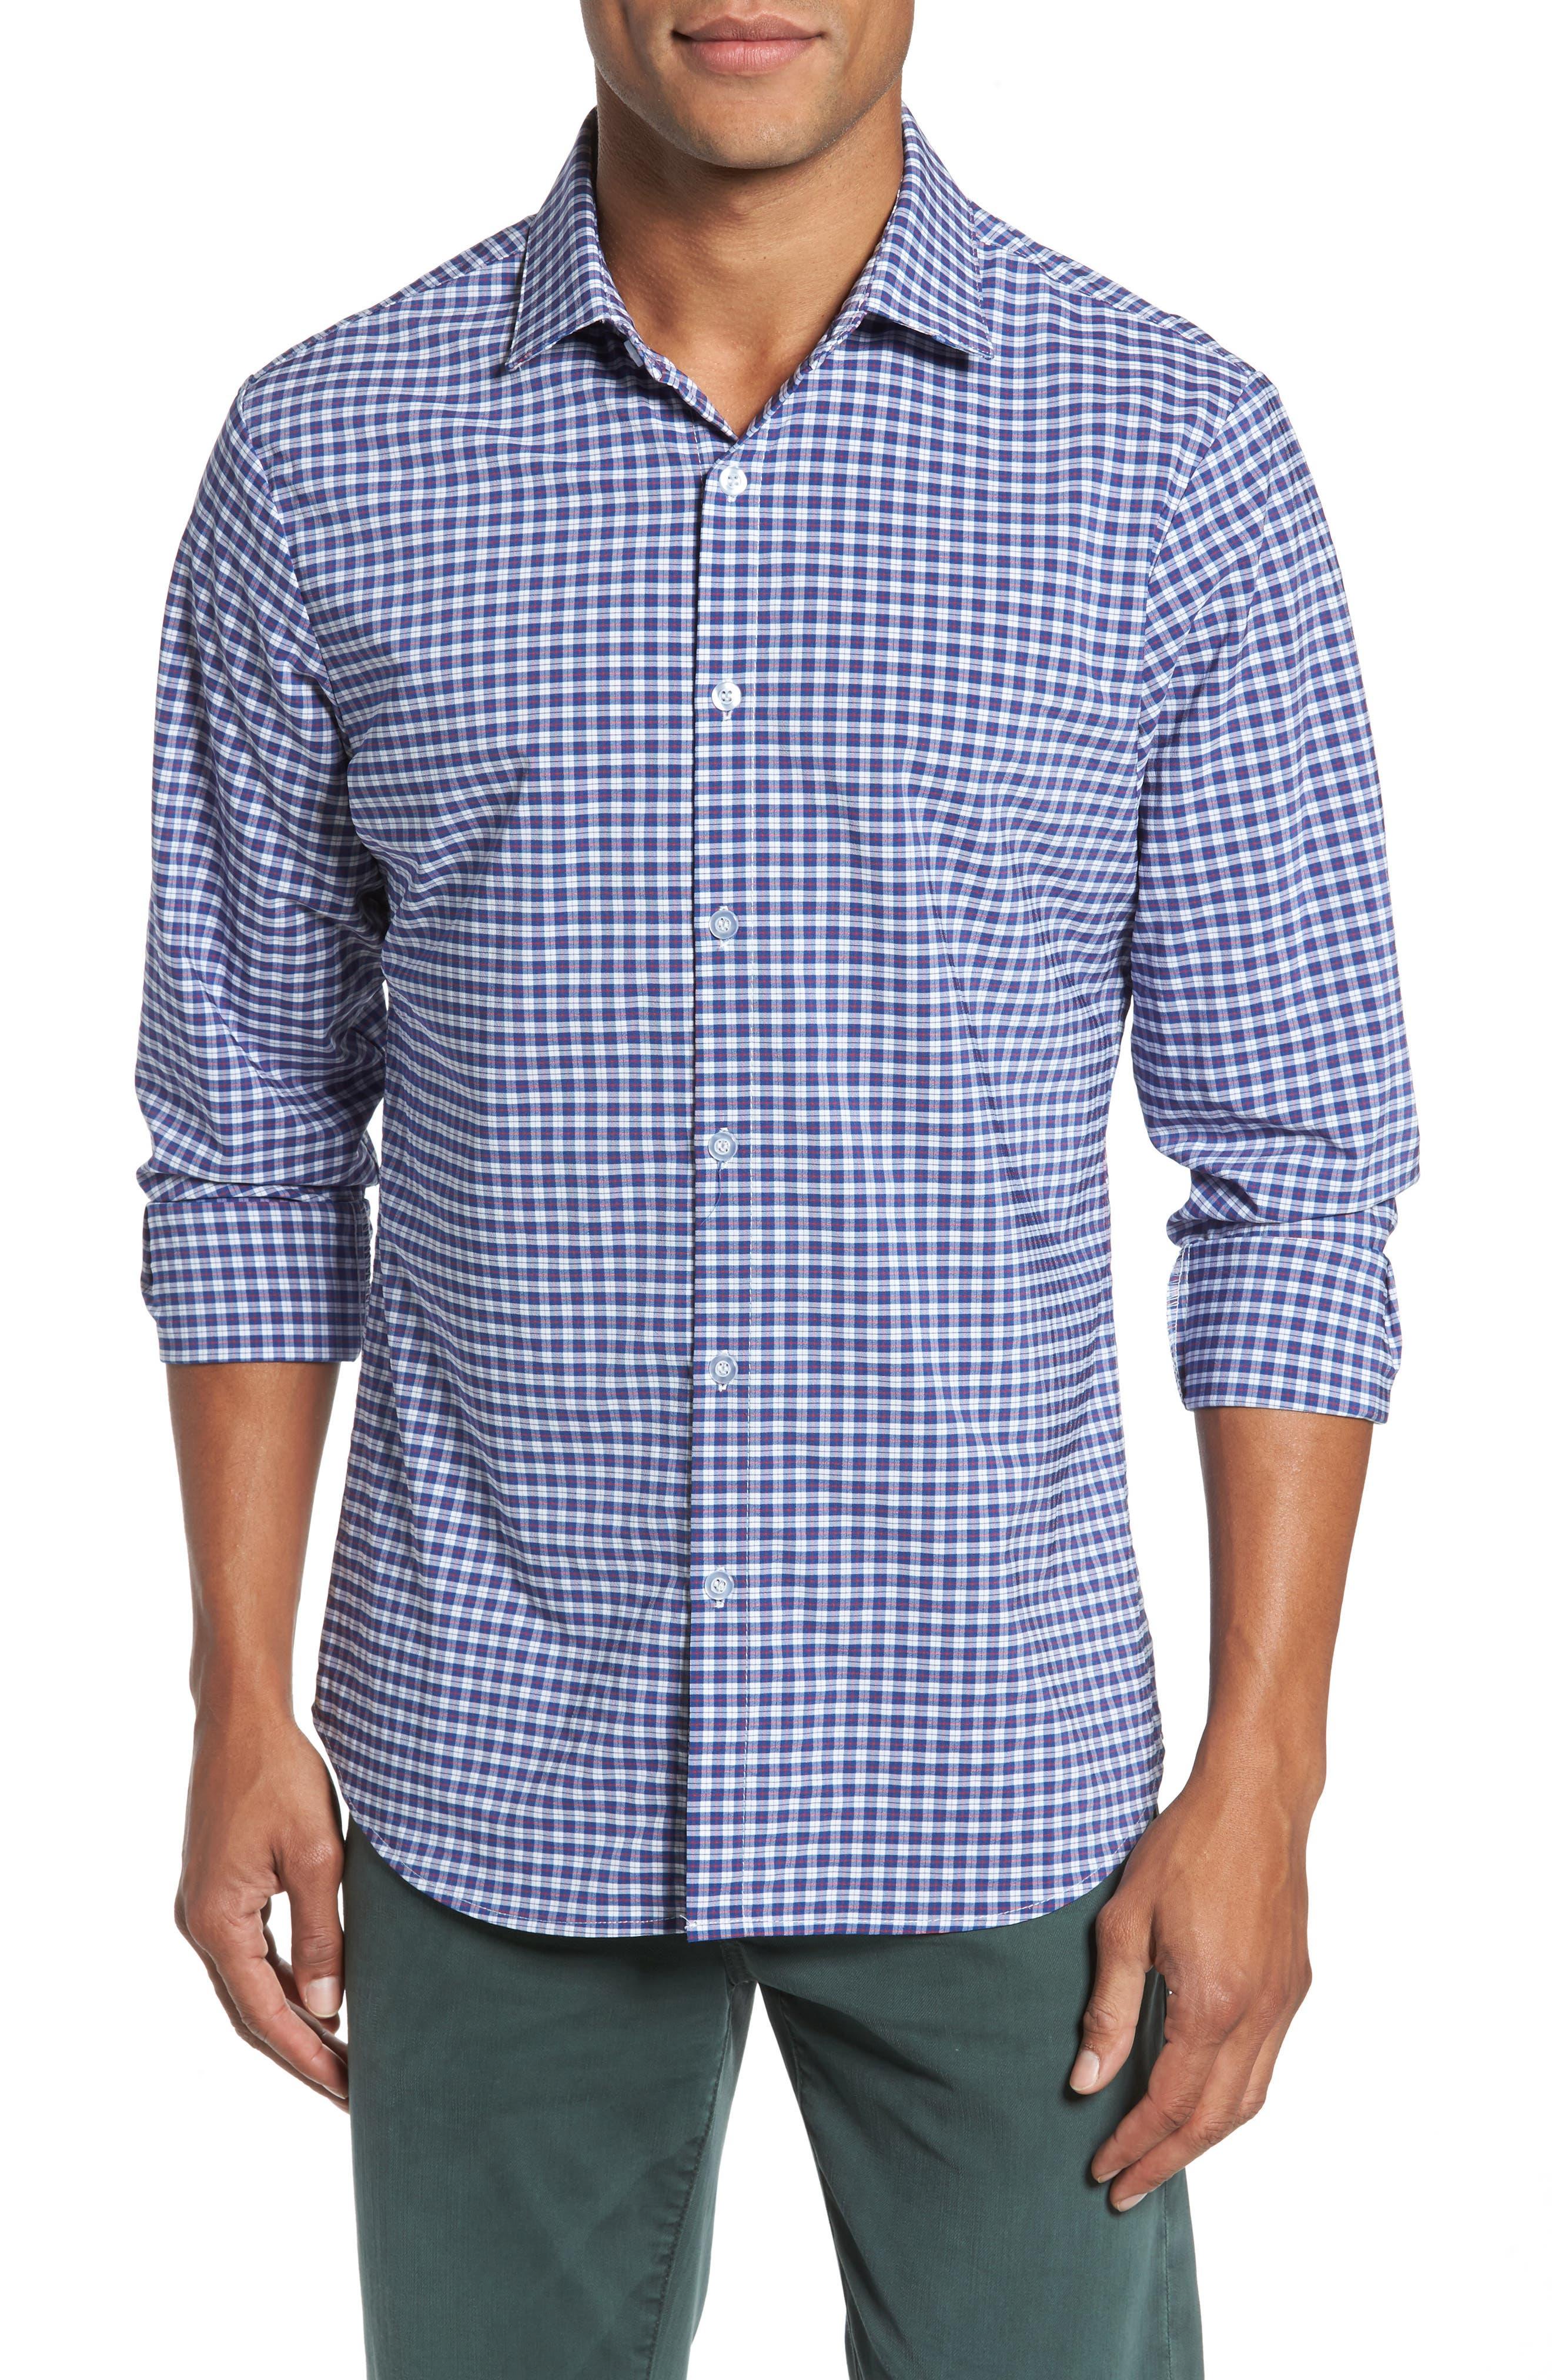 Alternate Image 1 Selected - Mizzen+Main Howe 2.0 Plaid Sport Shirt